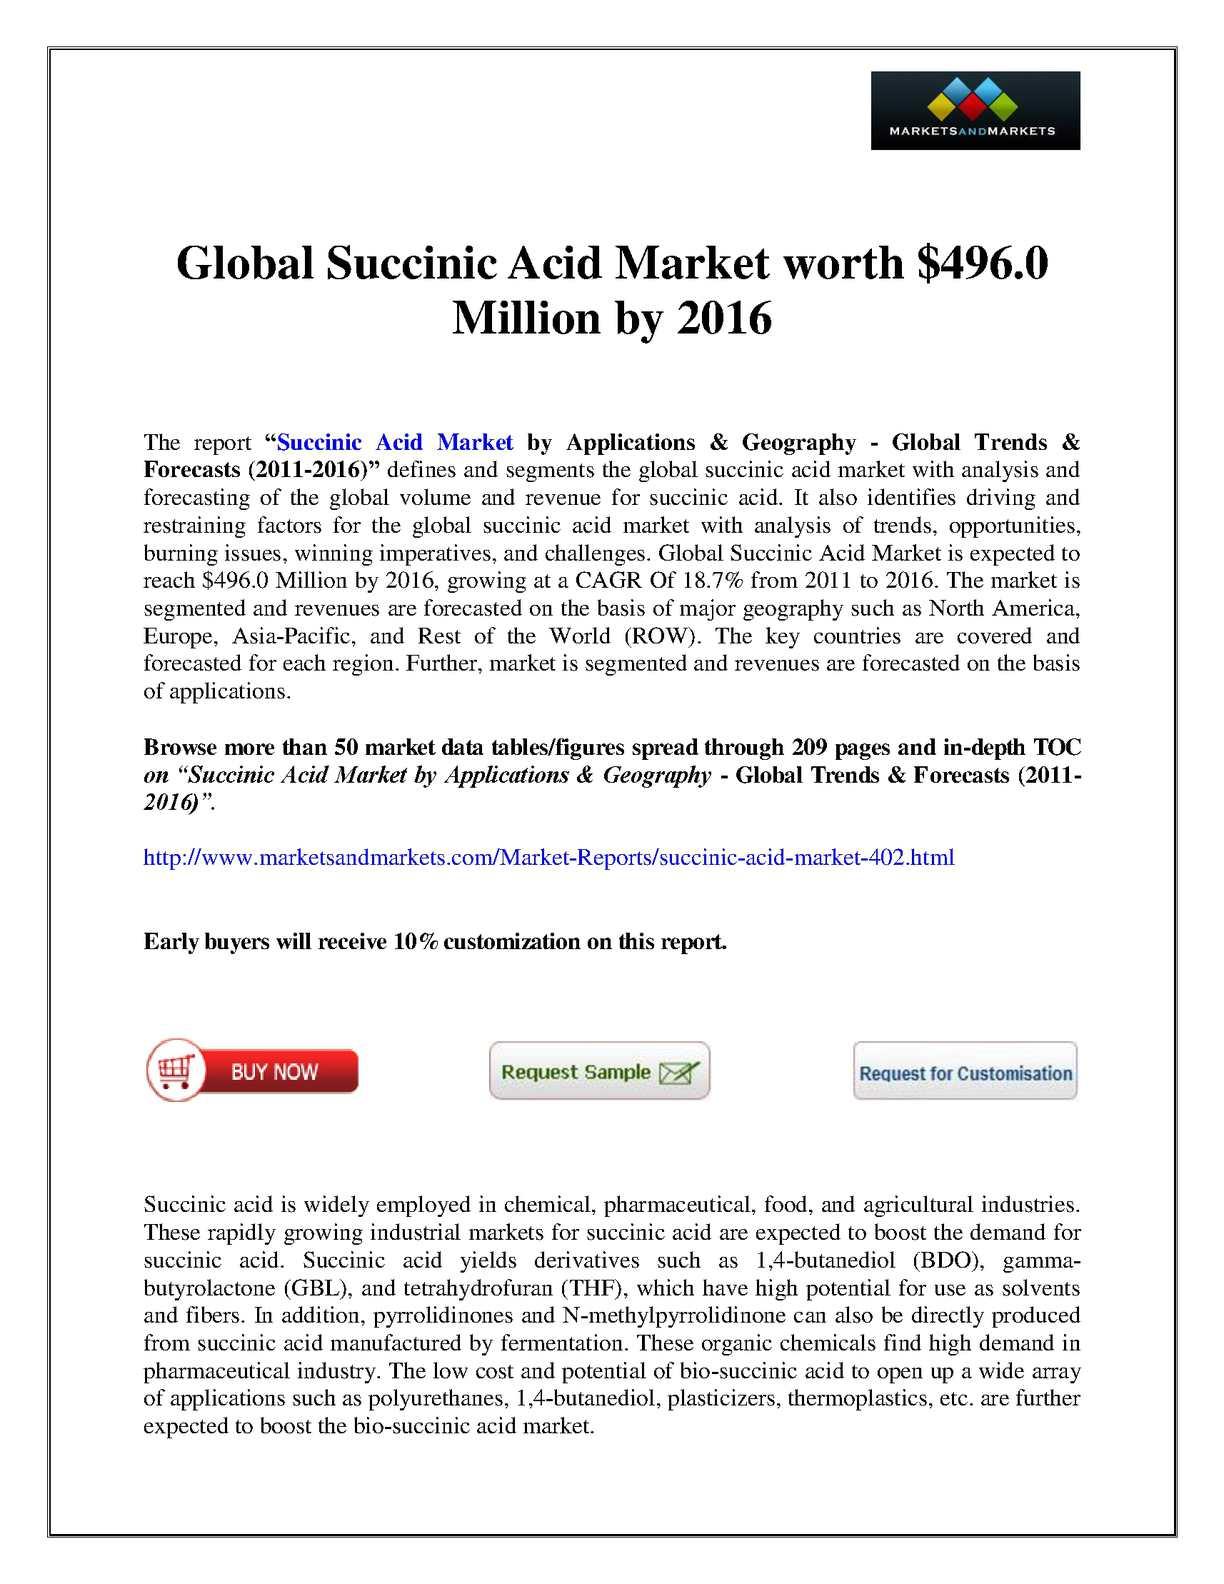 Calaméo - Succinic Acid Market 2016